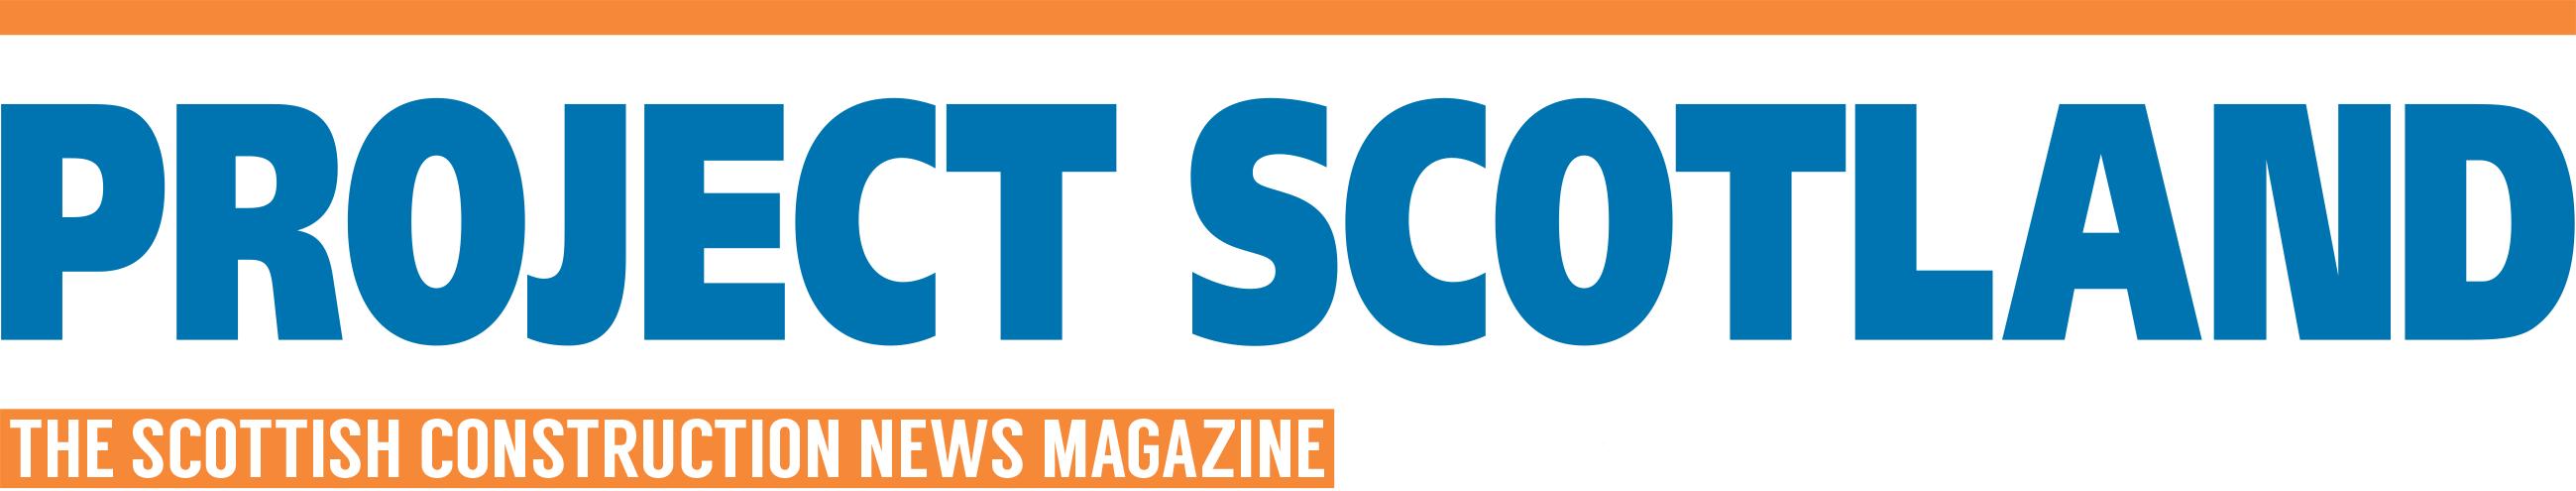 project scotland peebles media group